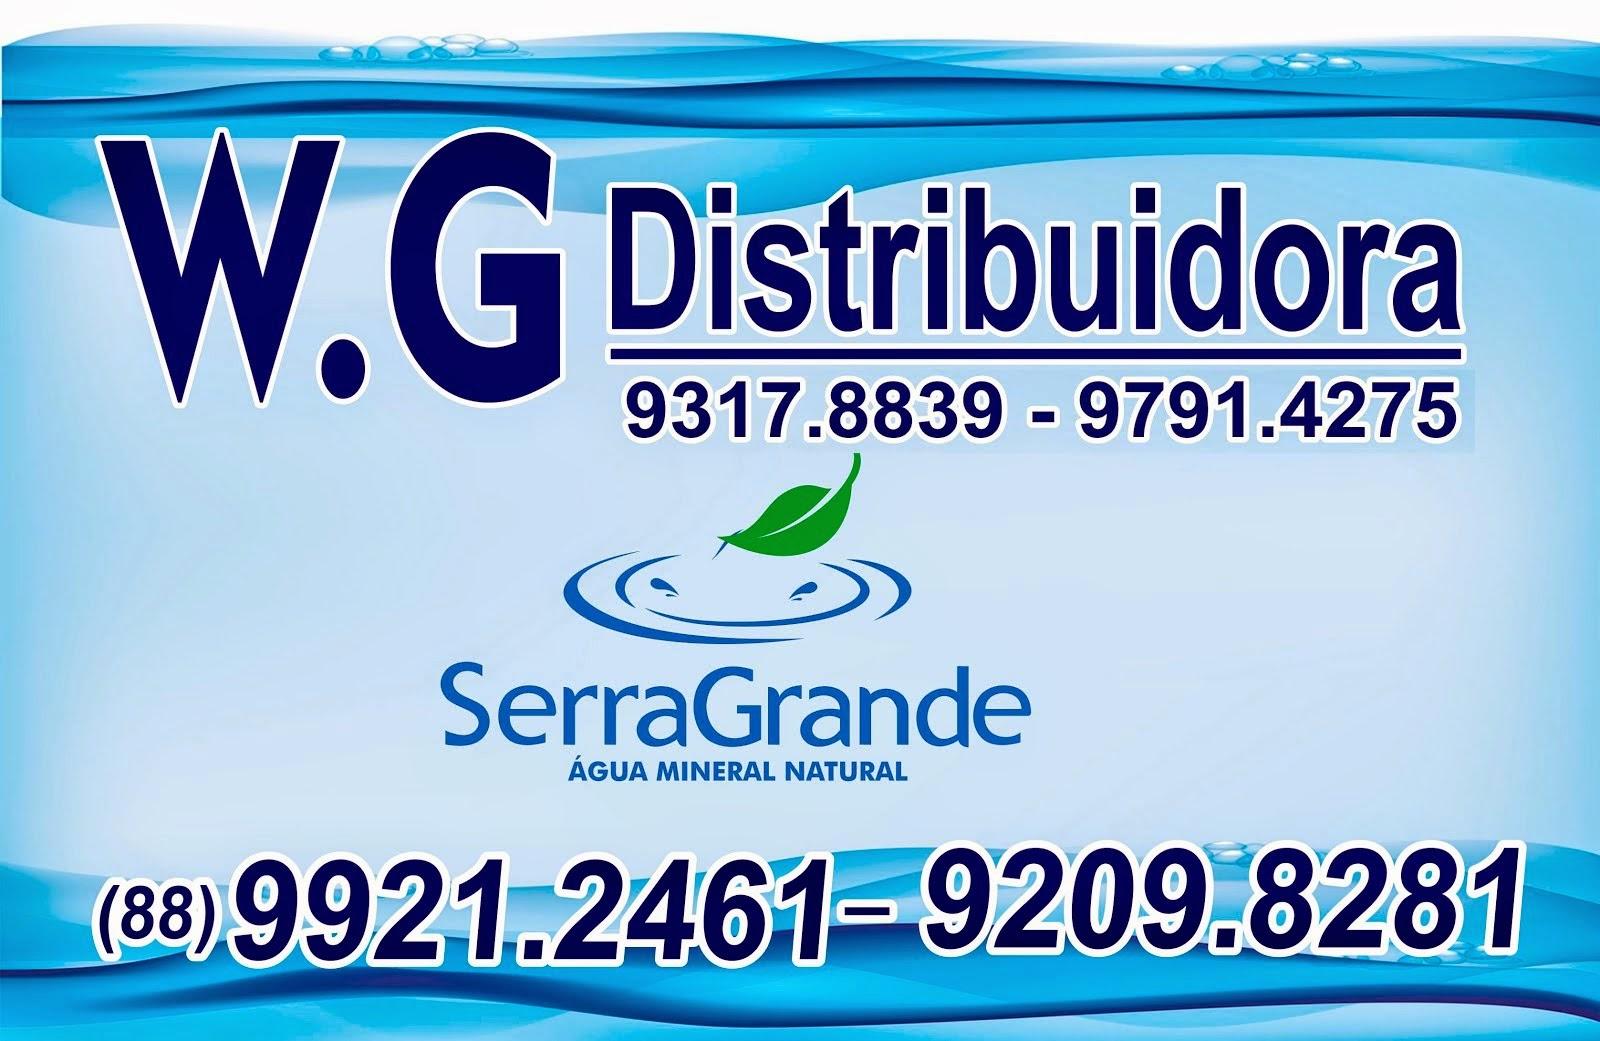 W.G DISTRIBUIDORA